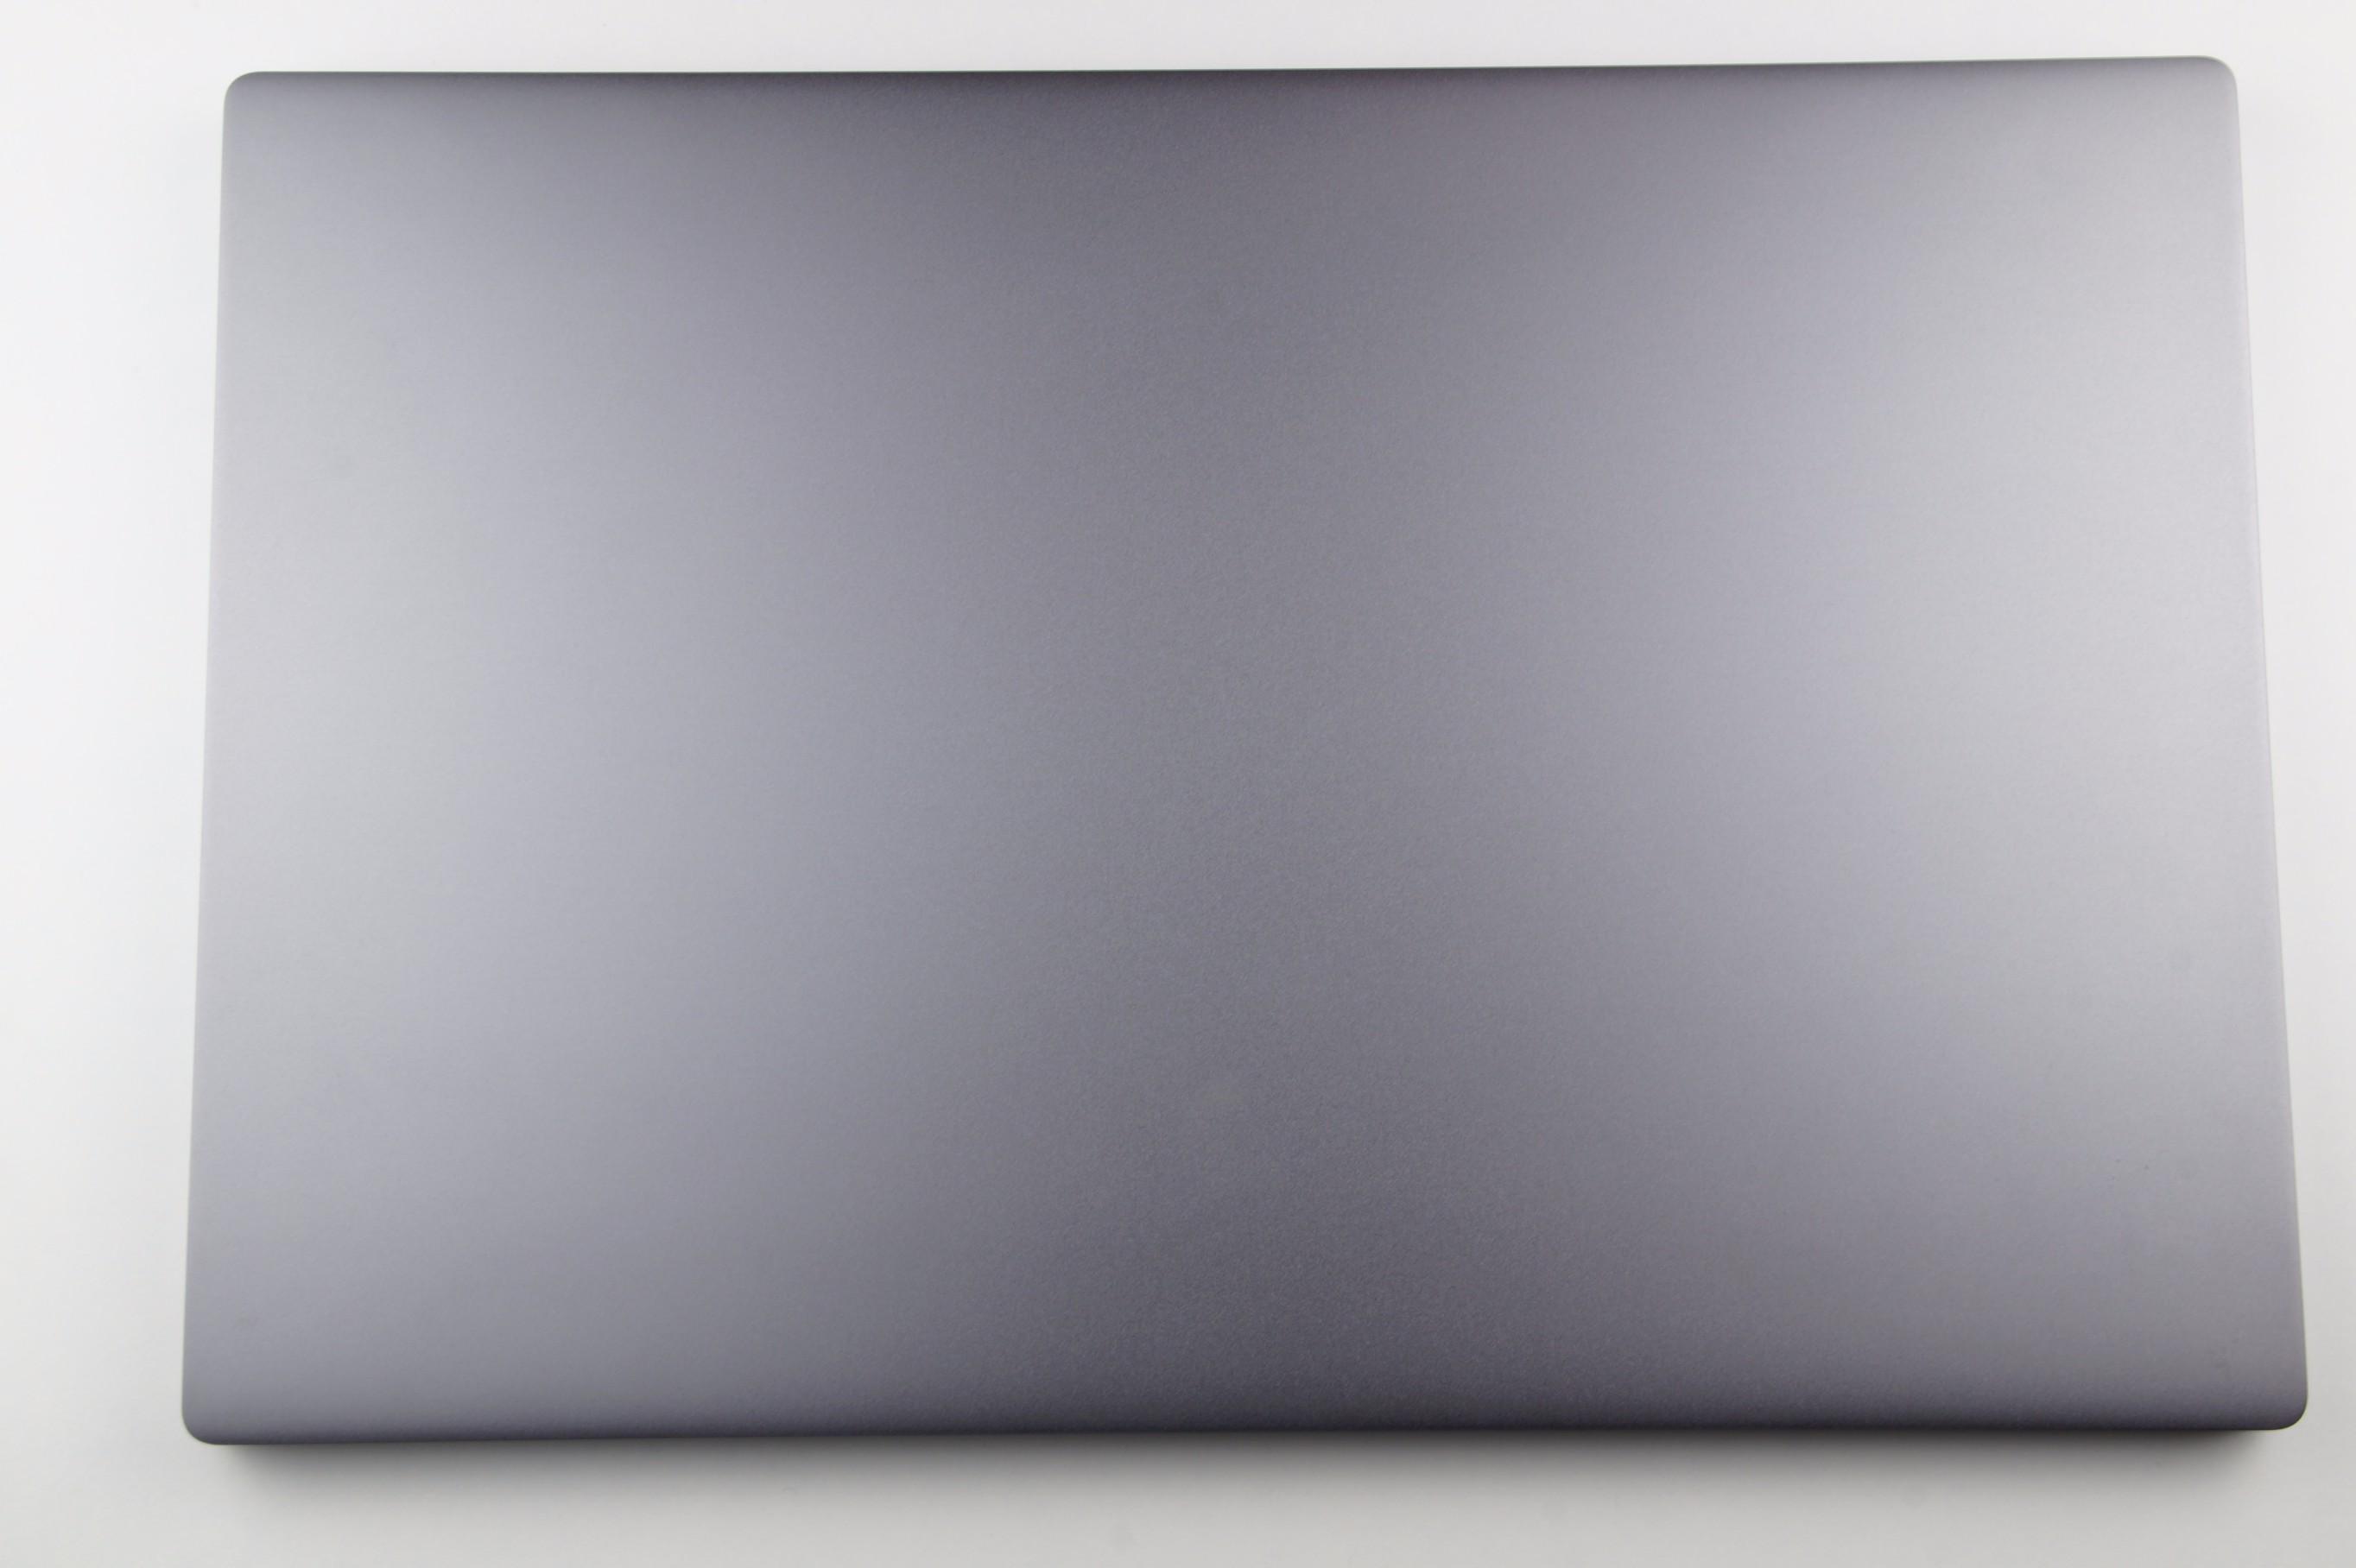 Xiaomi Mi Notebook Pro 1 1